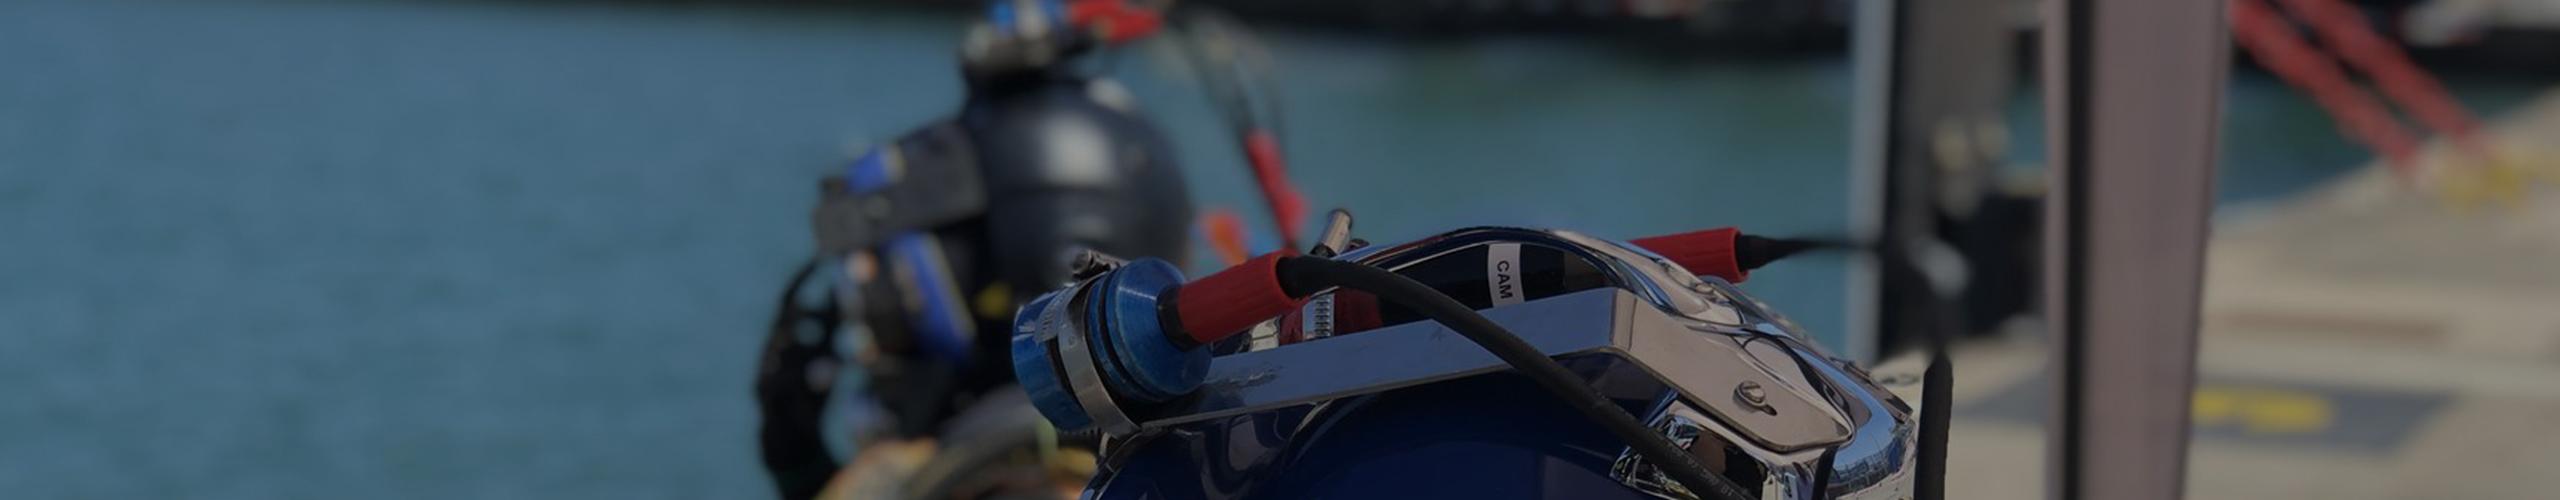 Subsea Maintenance AUV